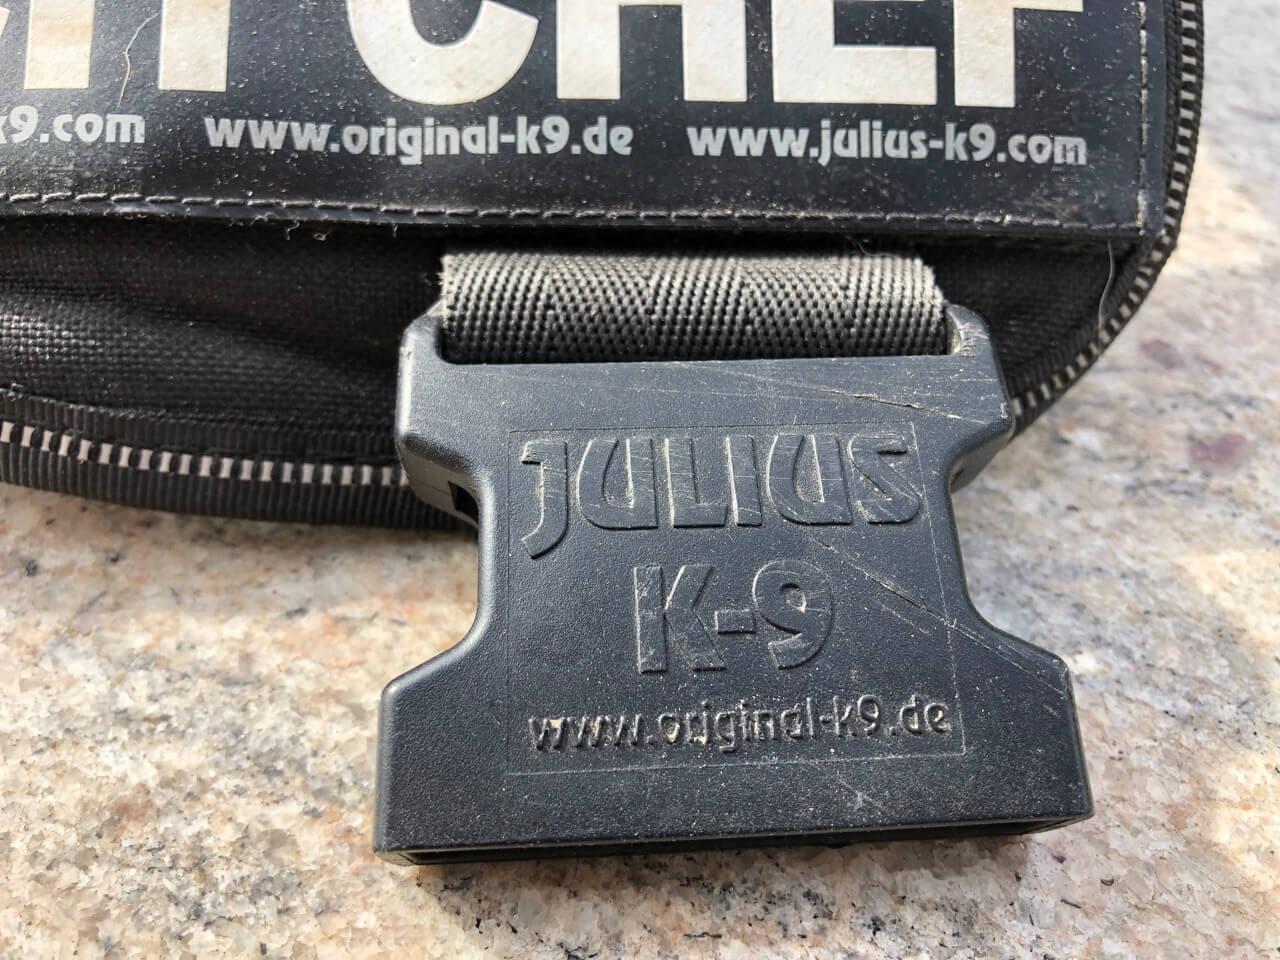 Julius K9 Verschluss